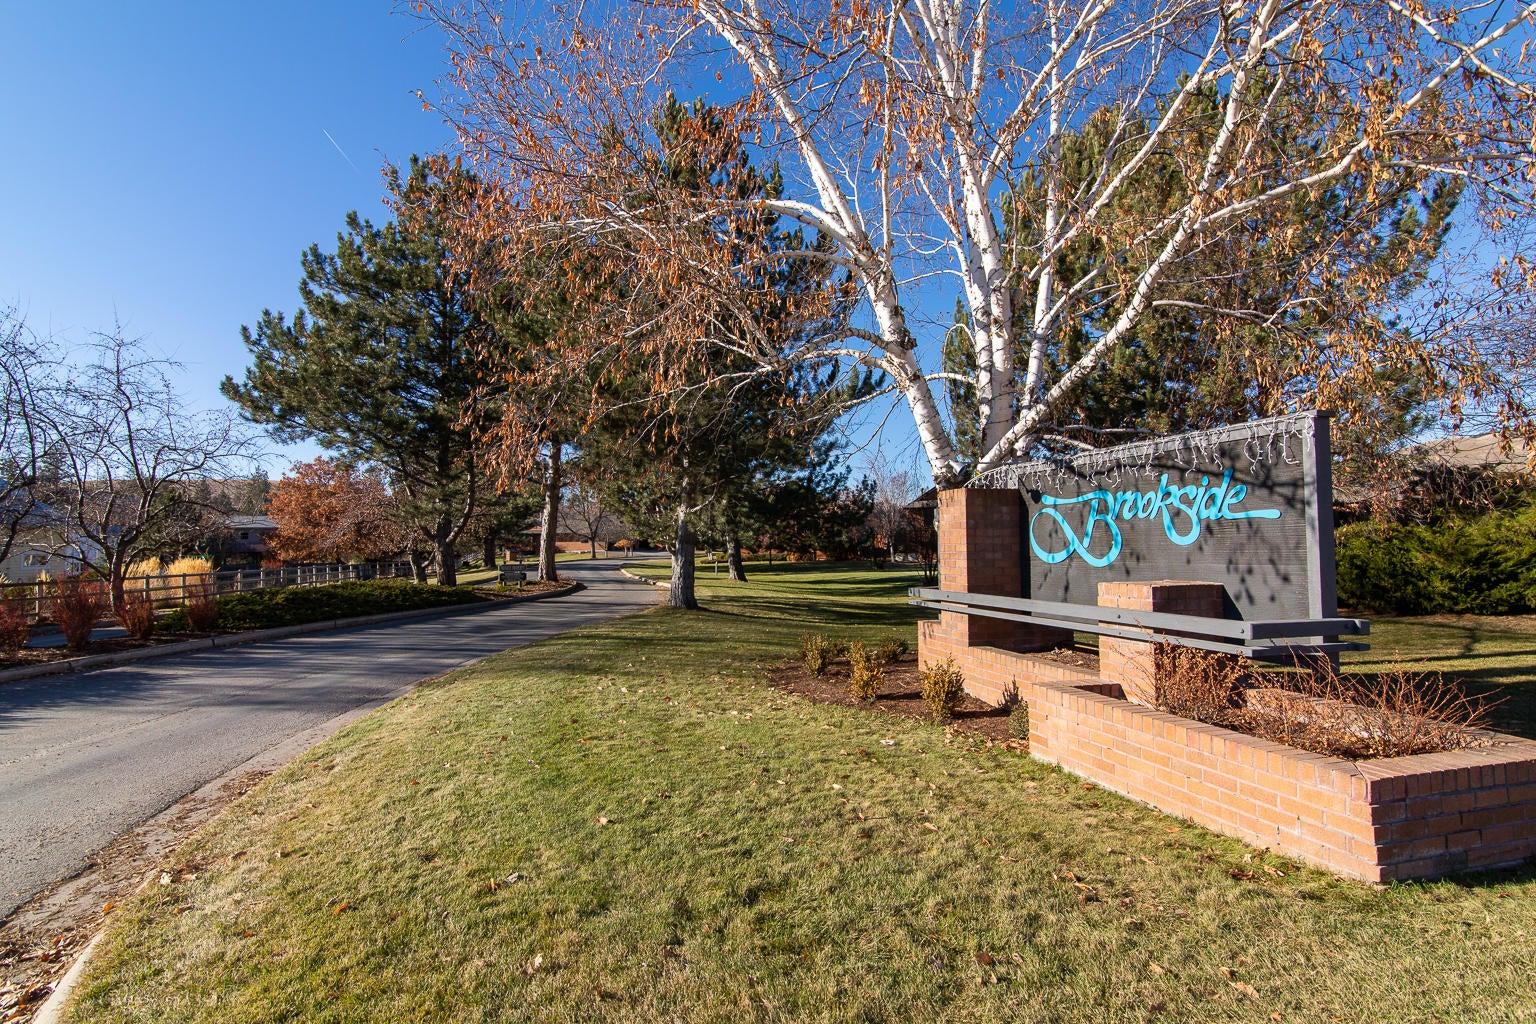 37 Brookside Way, Missoula, MT 59802